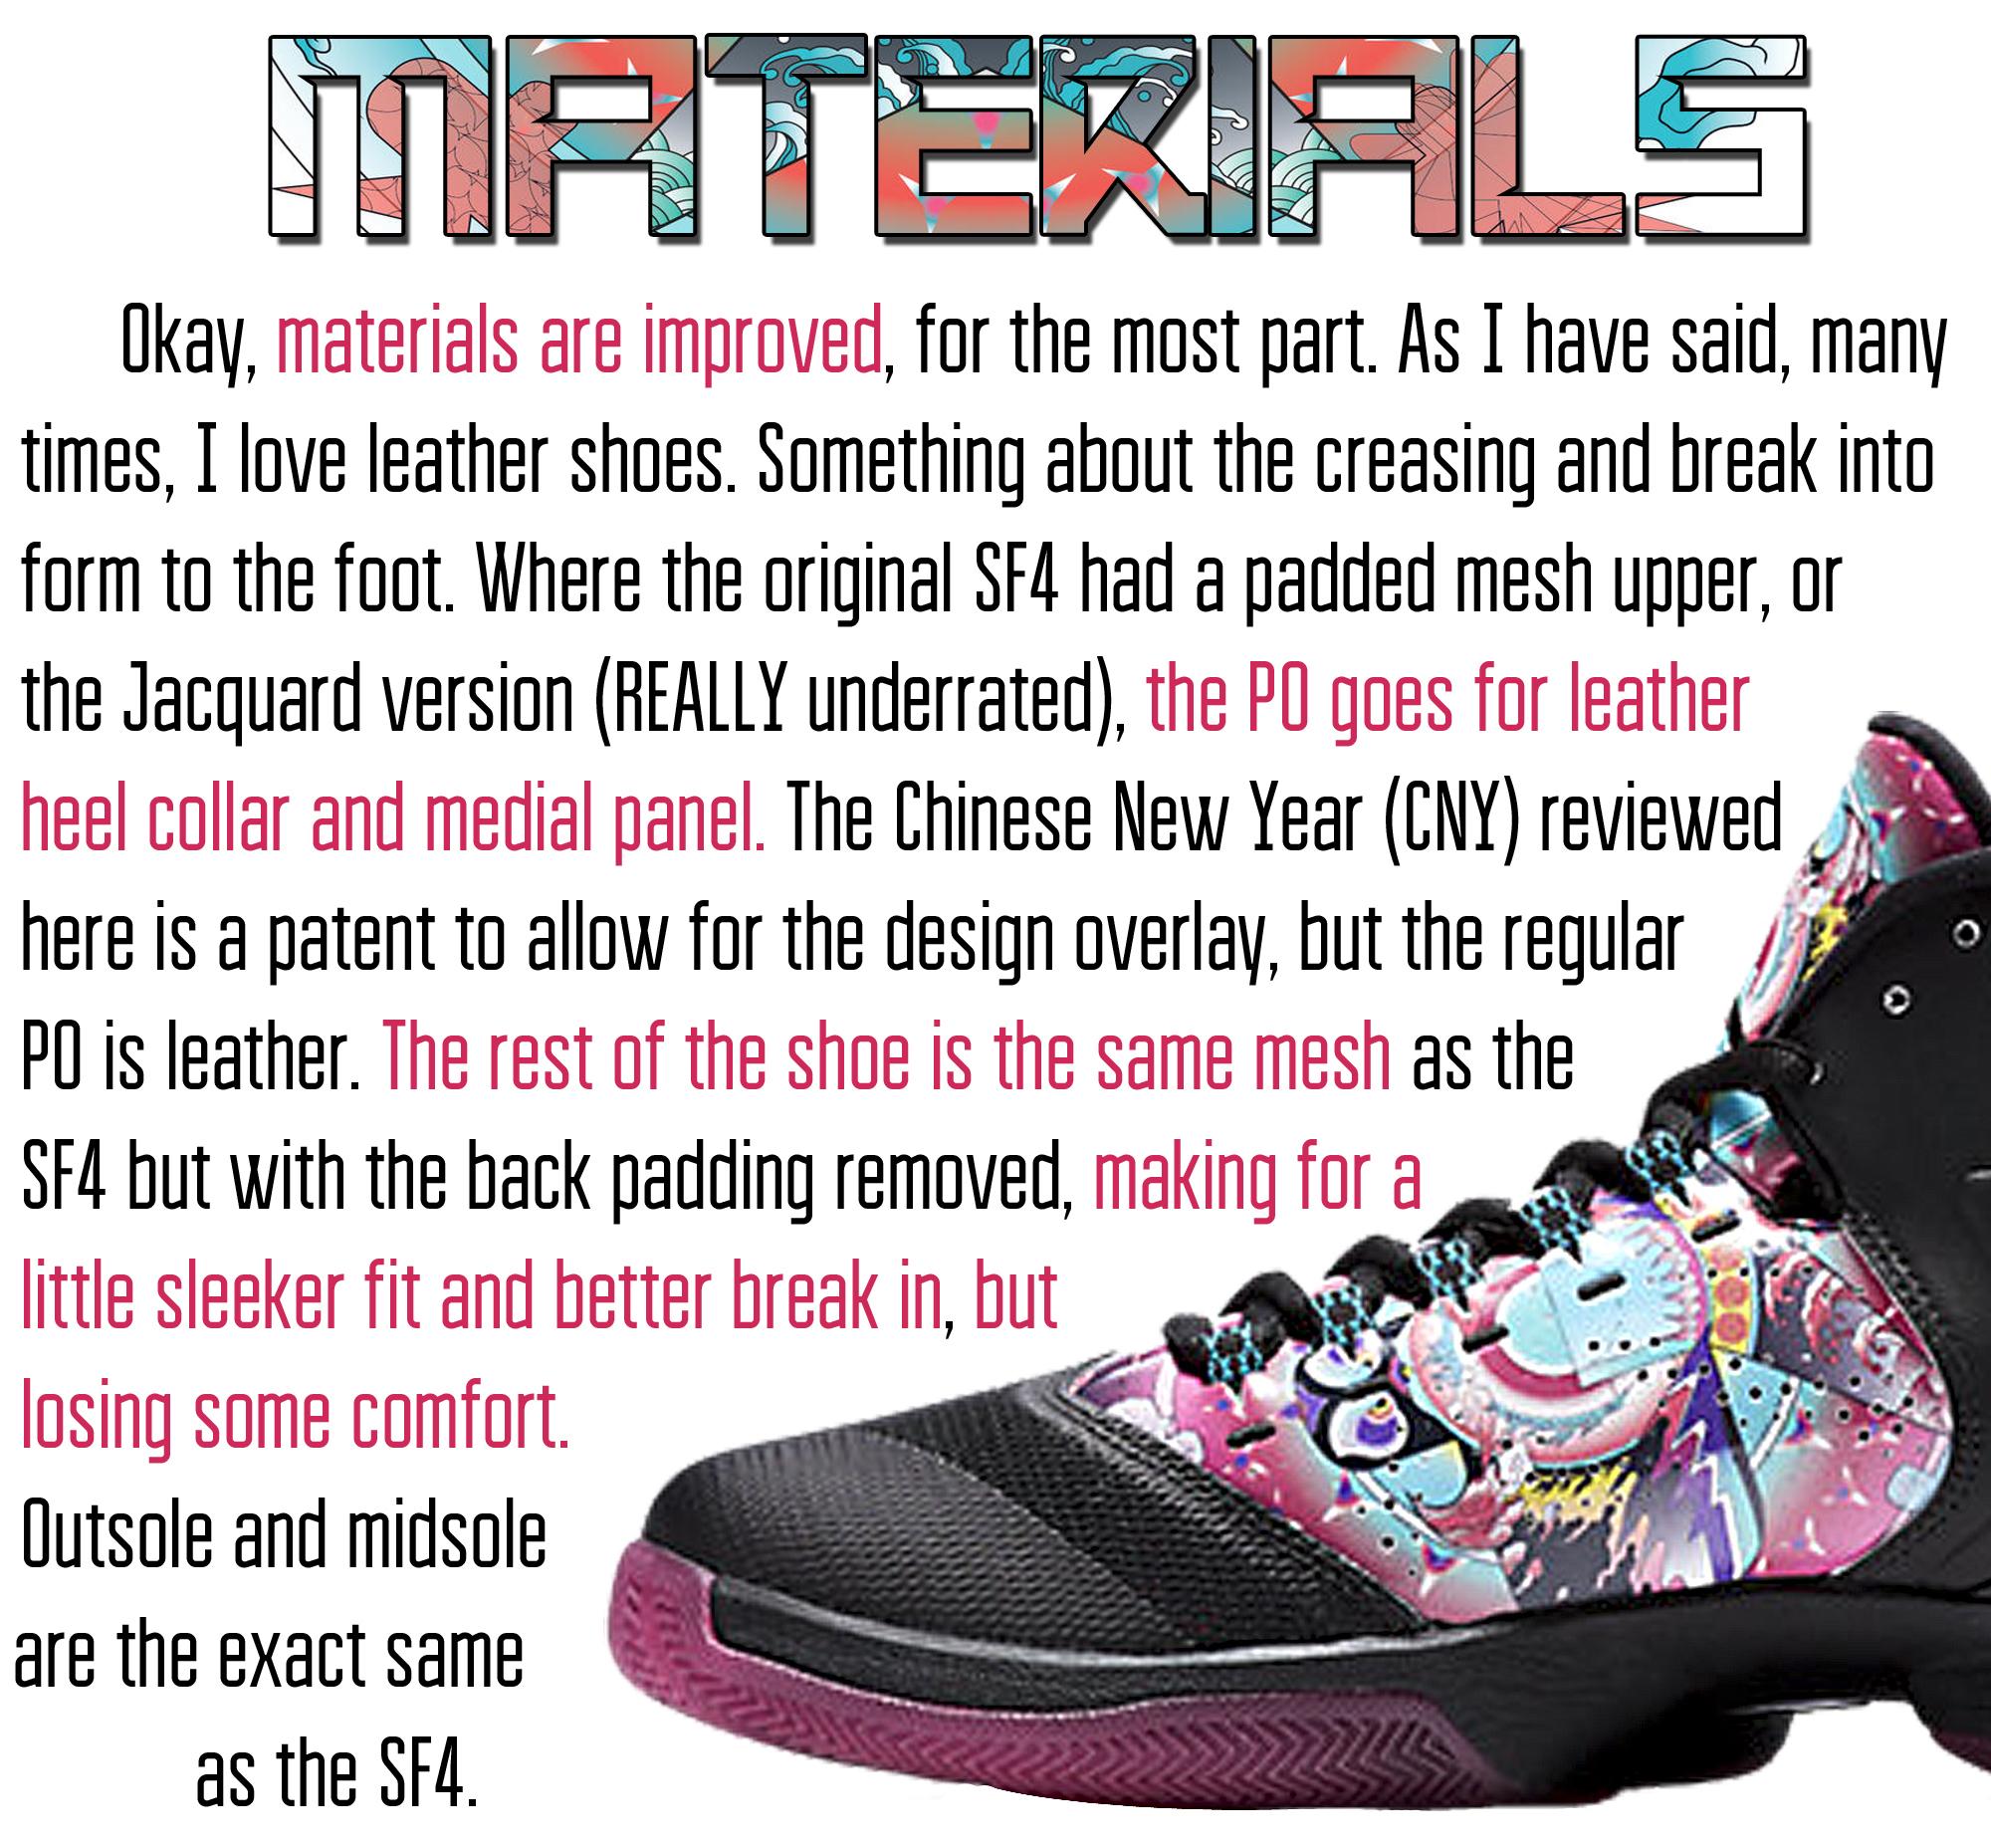 Superfly 4.PO - Materials